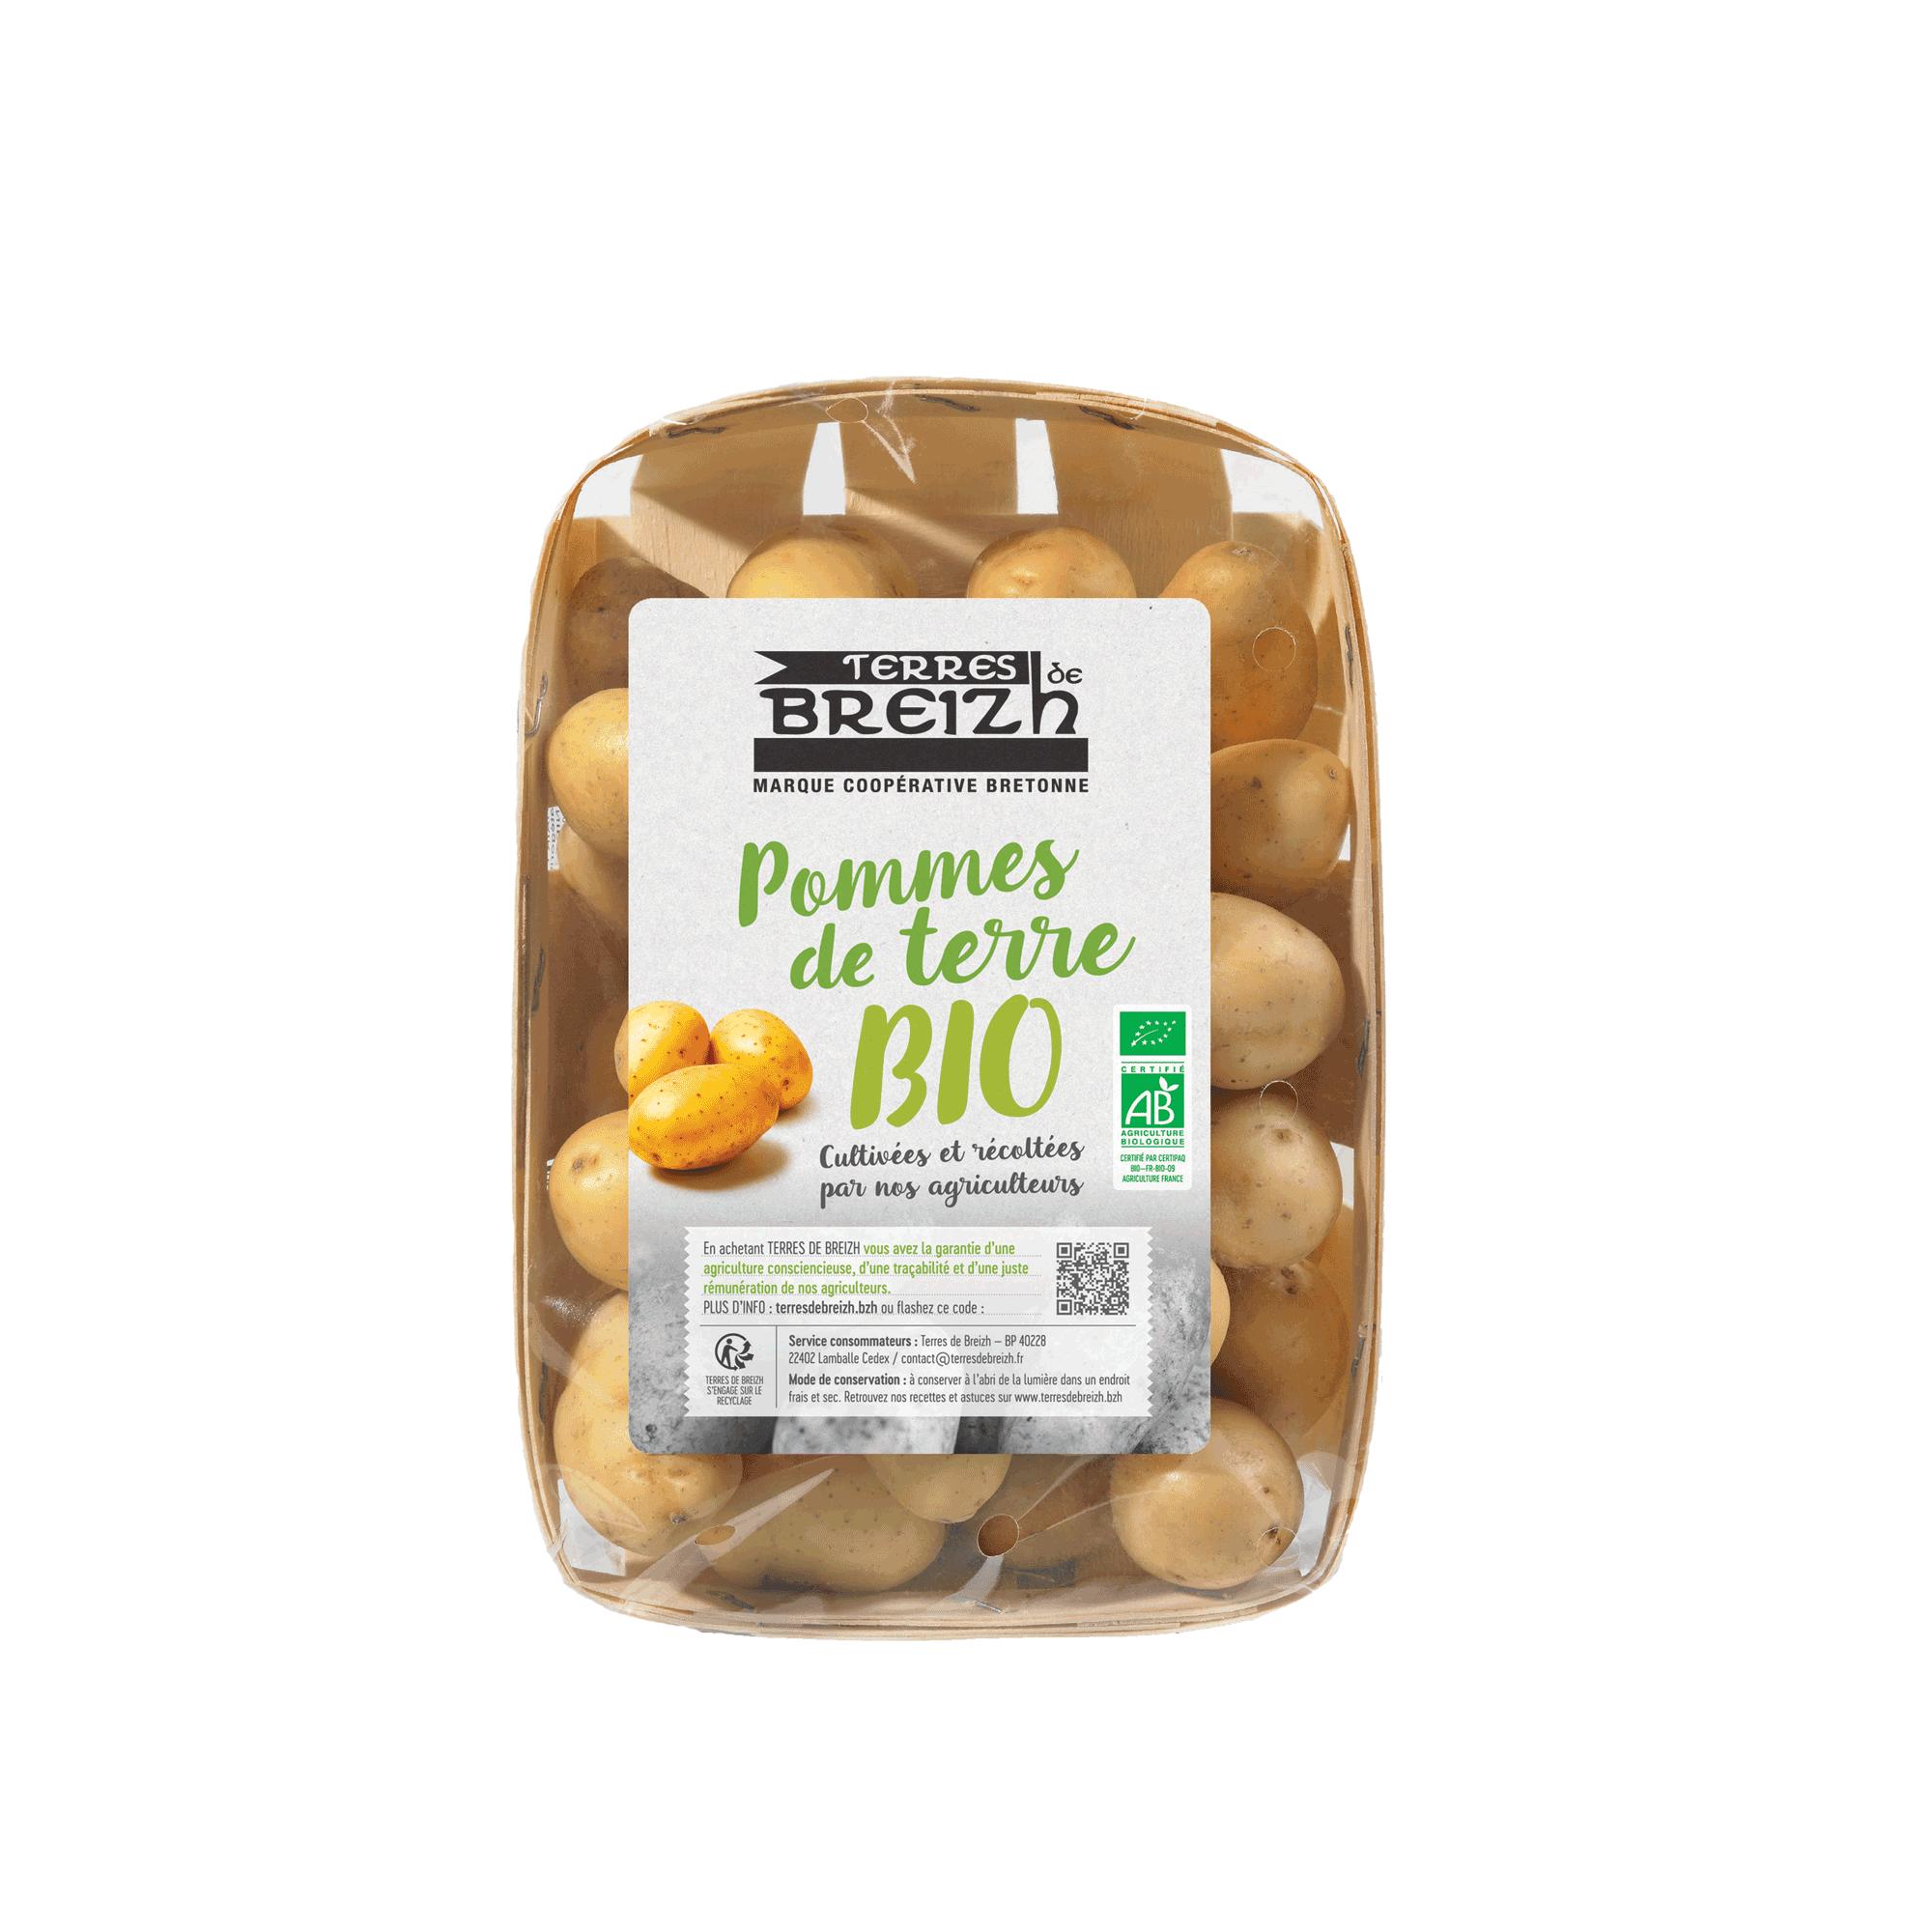 Pommes-de-terre-Bio-Terres--de-Breizh---web